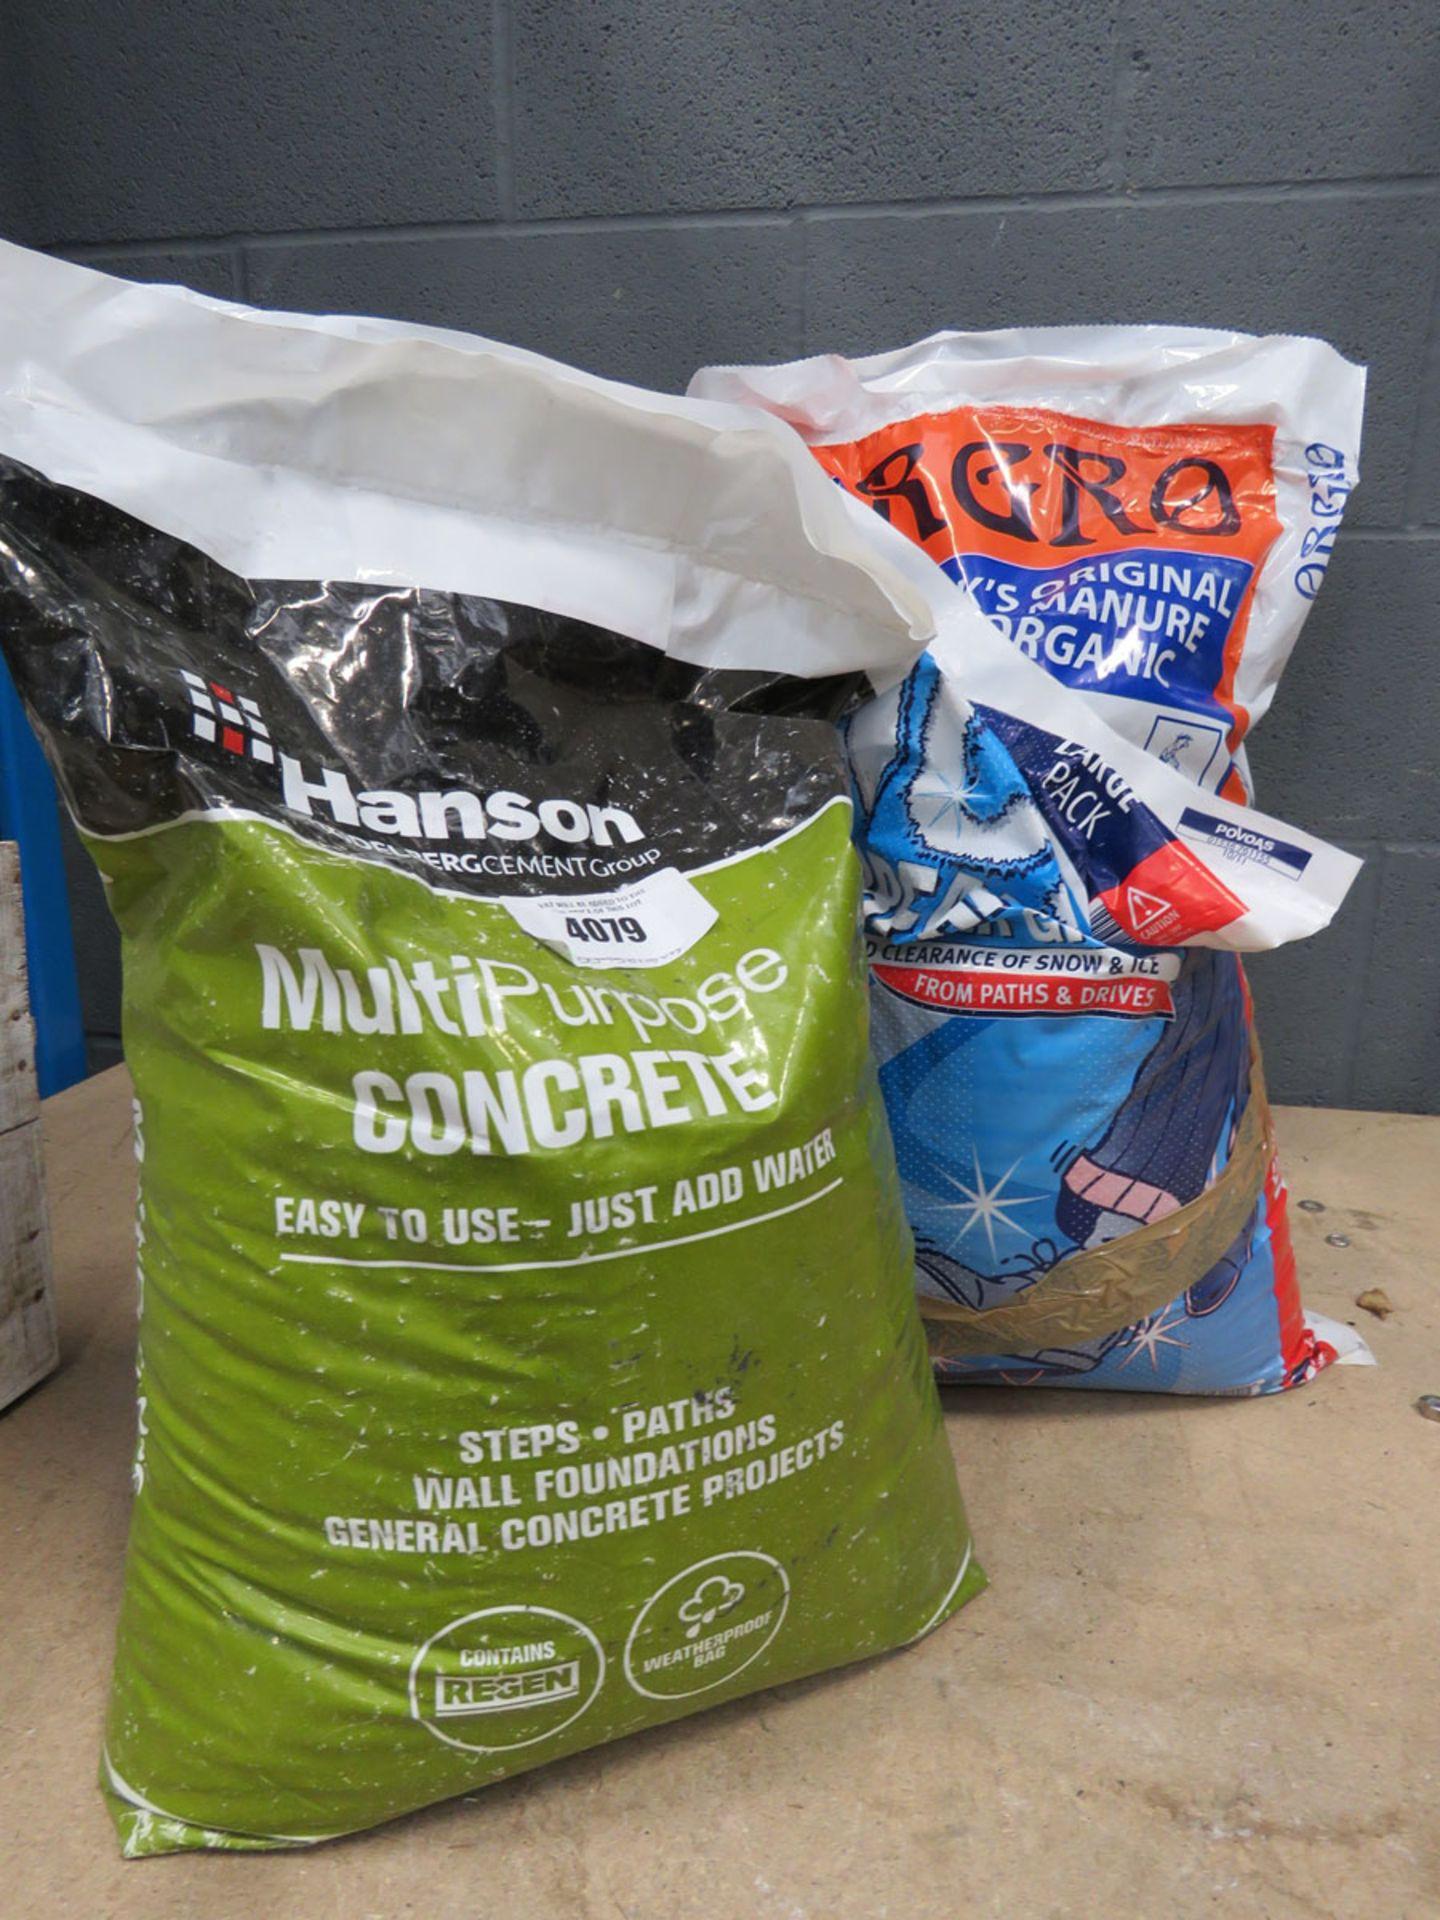 4101 Bag of multi purpose concrete, bag of rock salt, and bag of manure